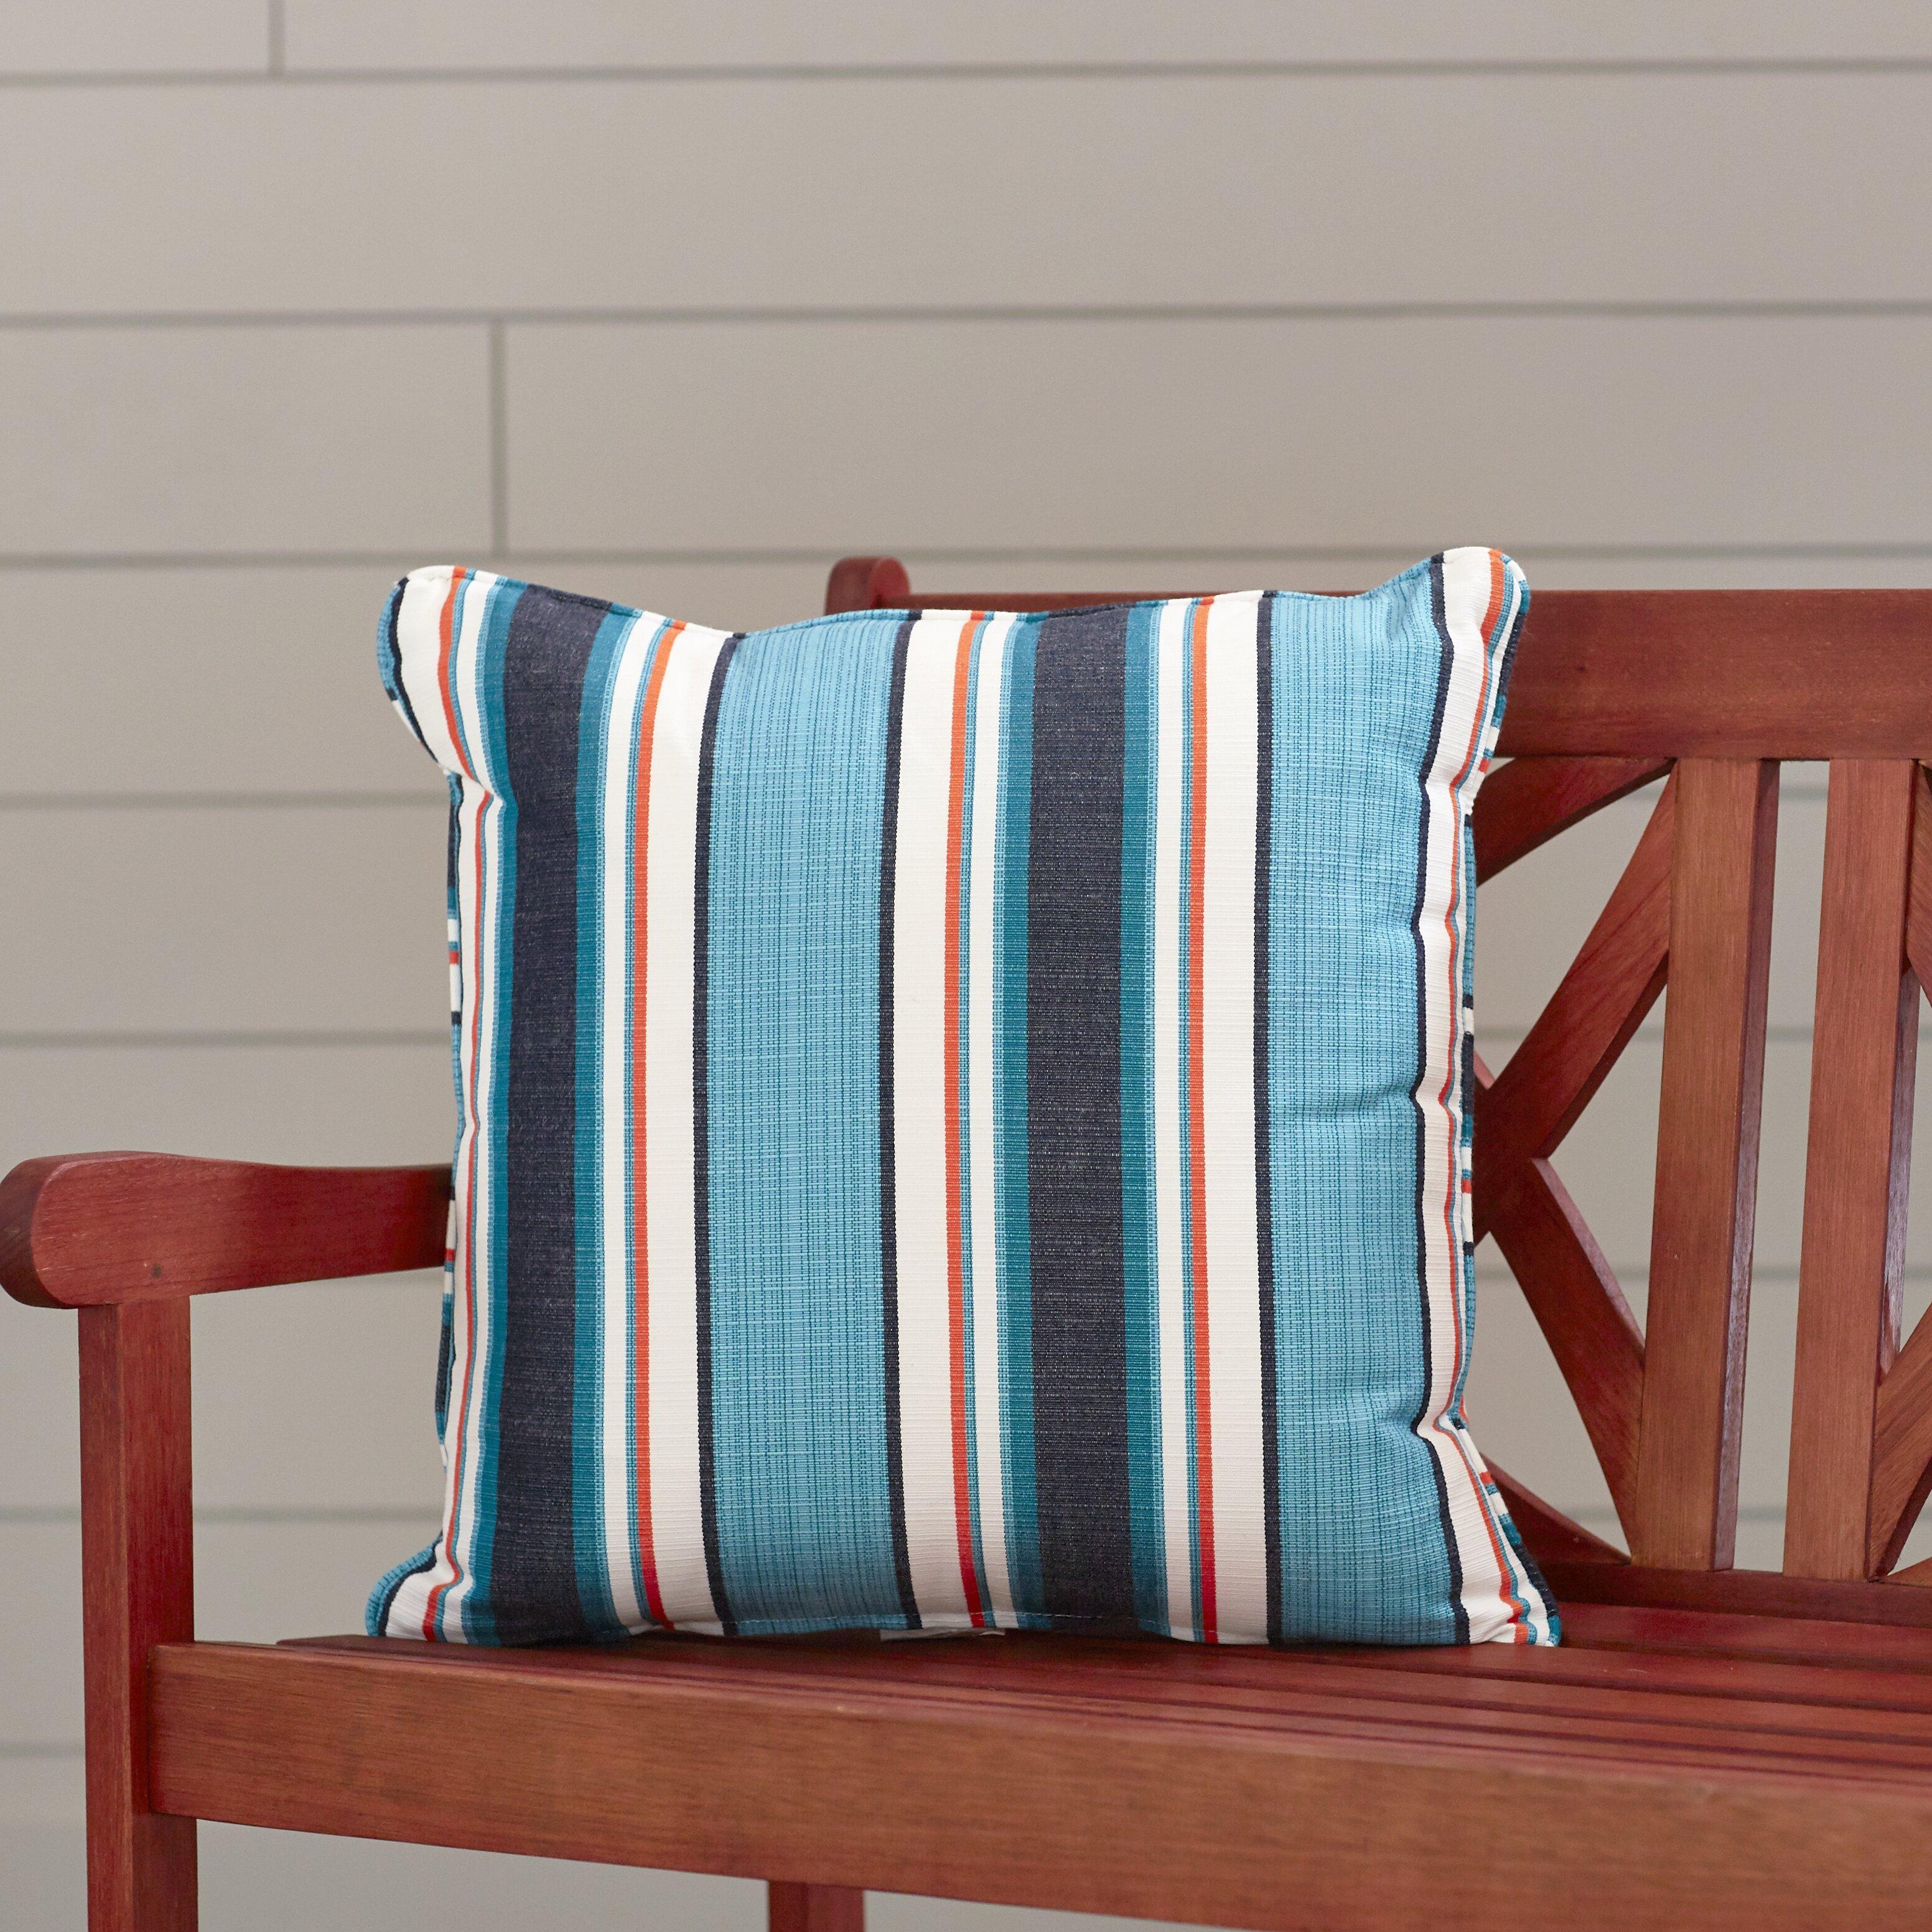 Custom Sunbrella Throw Pillows : Wayfair Custom Outdoor Cushions Outdoor Sunbrella Throw Pillow & Reviews Wayfair.ca